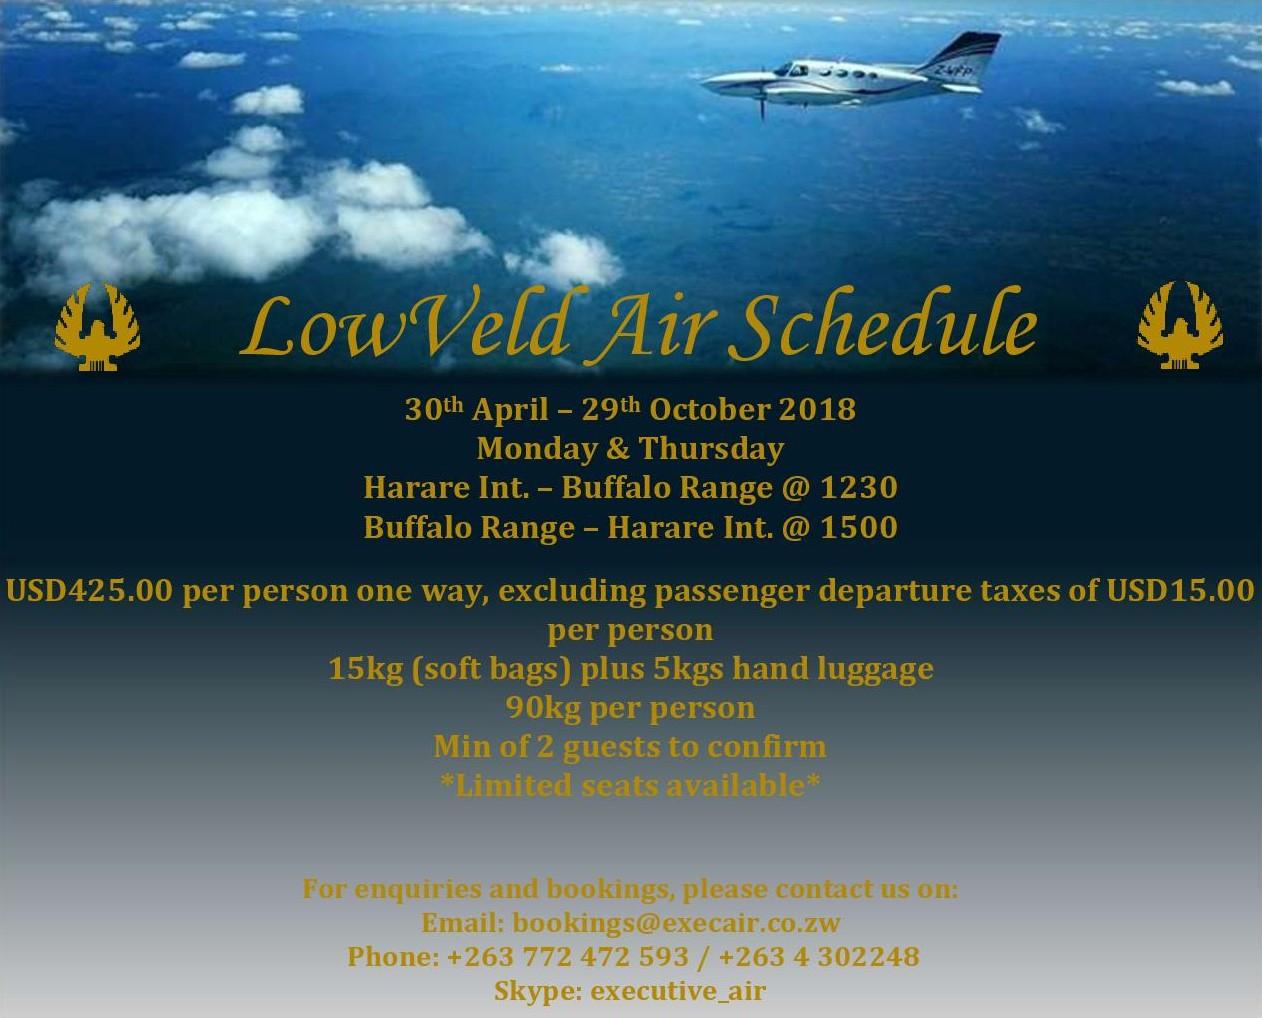 2018 Lowveld Air Schedule - Buffalo Range / Chiredzi